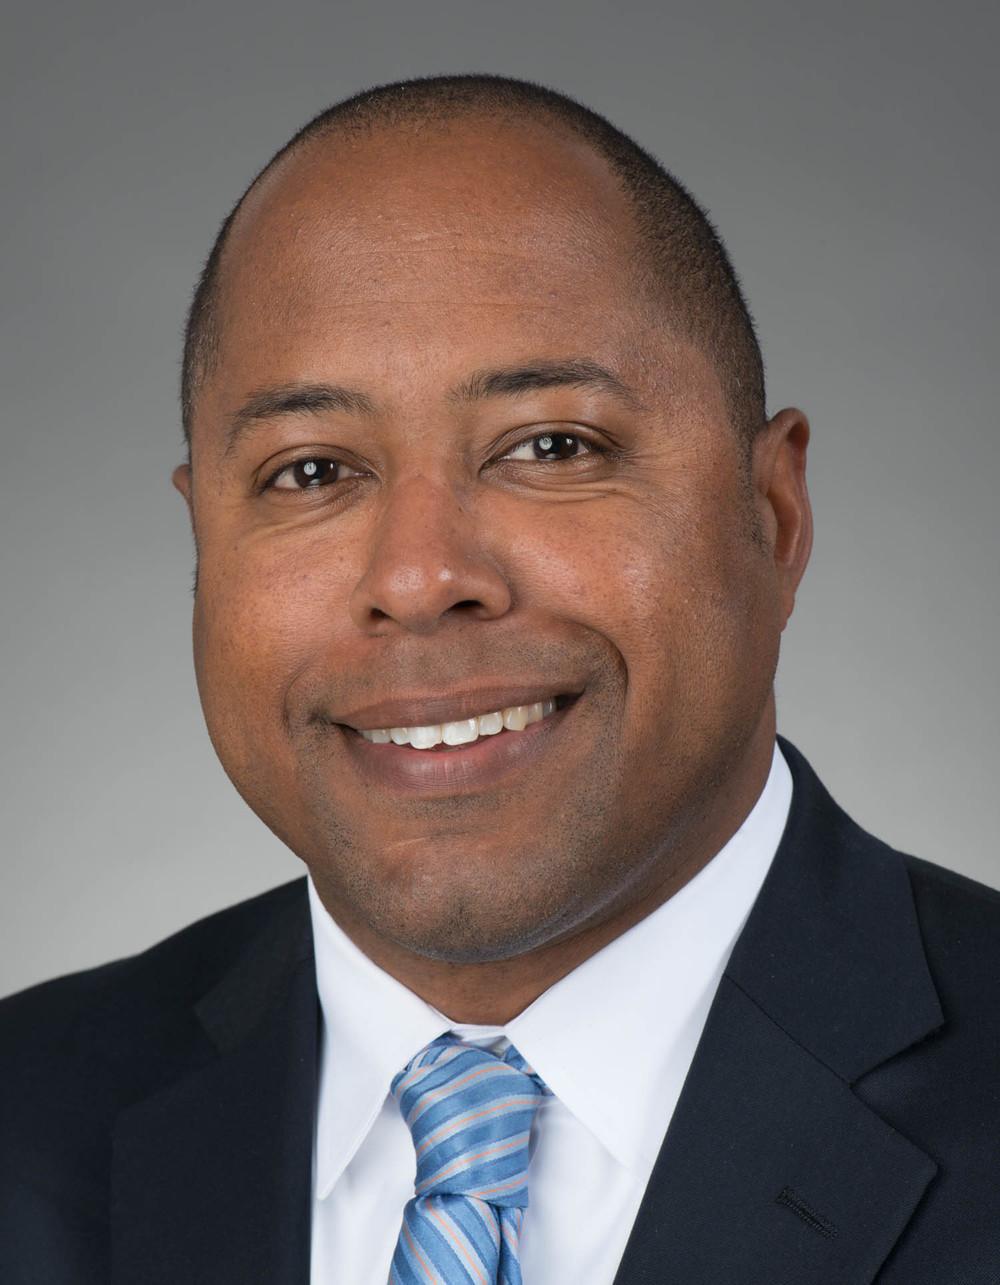 Tyrone Brooks,Senior Director,Major League Baseball's Front Office and Field Staff Diversity Pipeline Program.